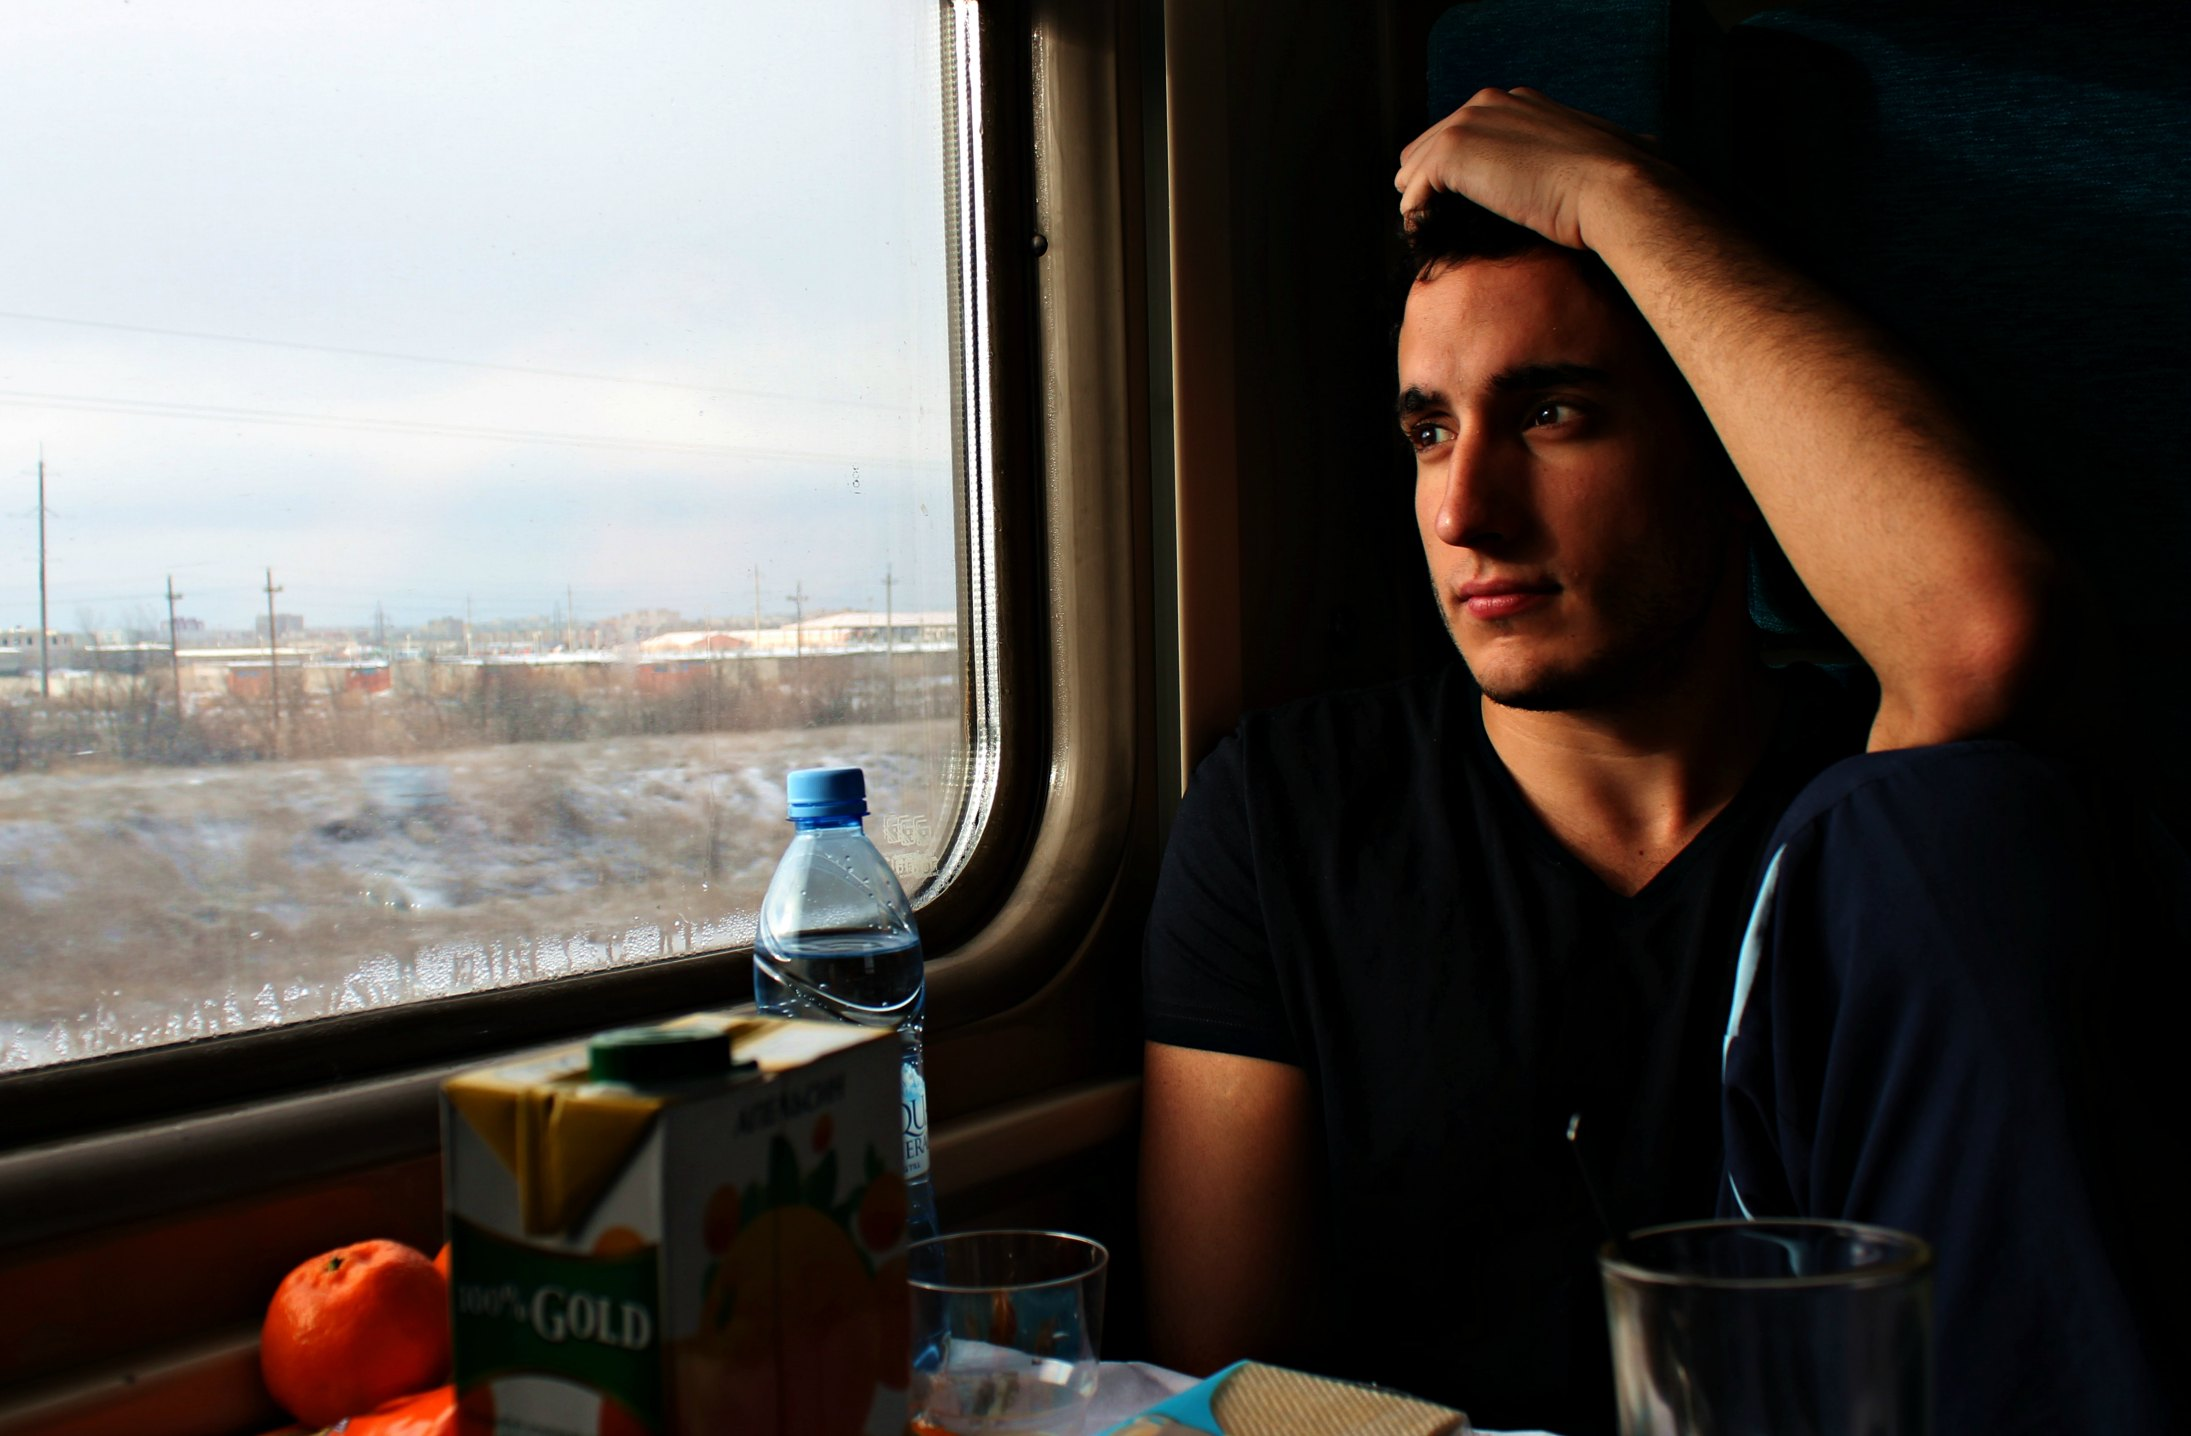 Tren Moscú - Volvogrado